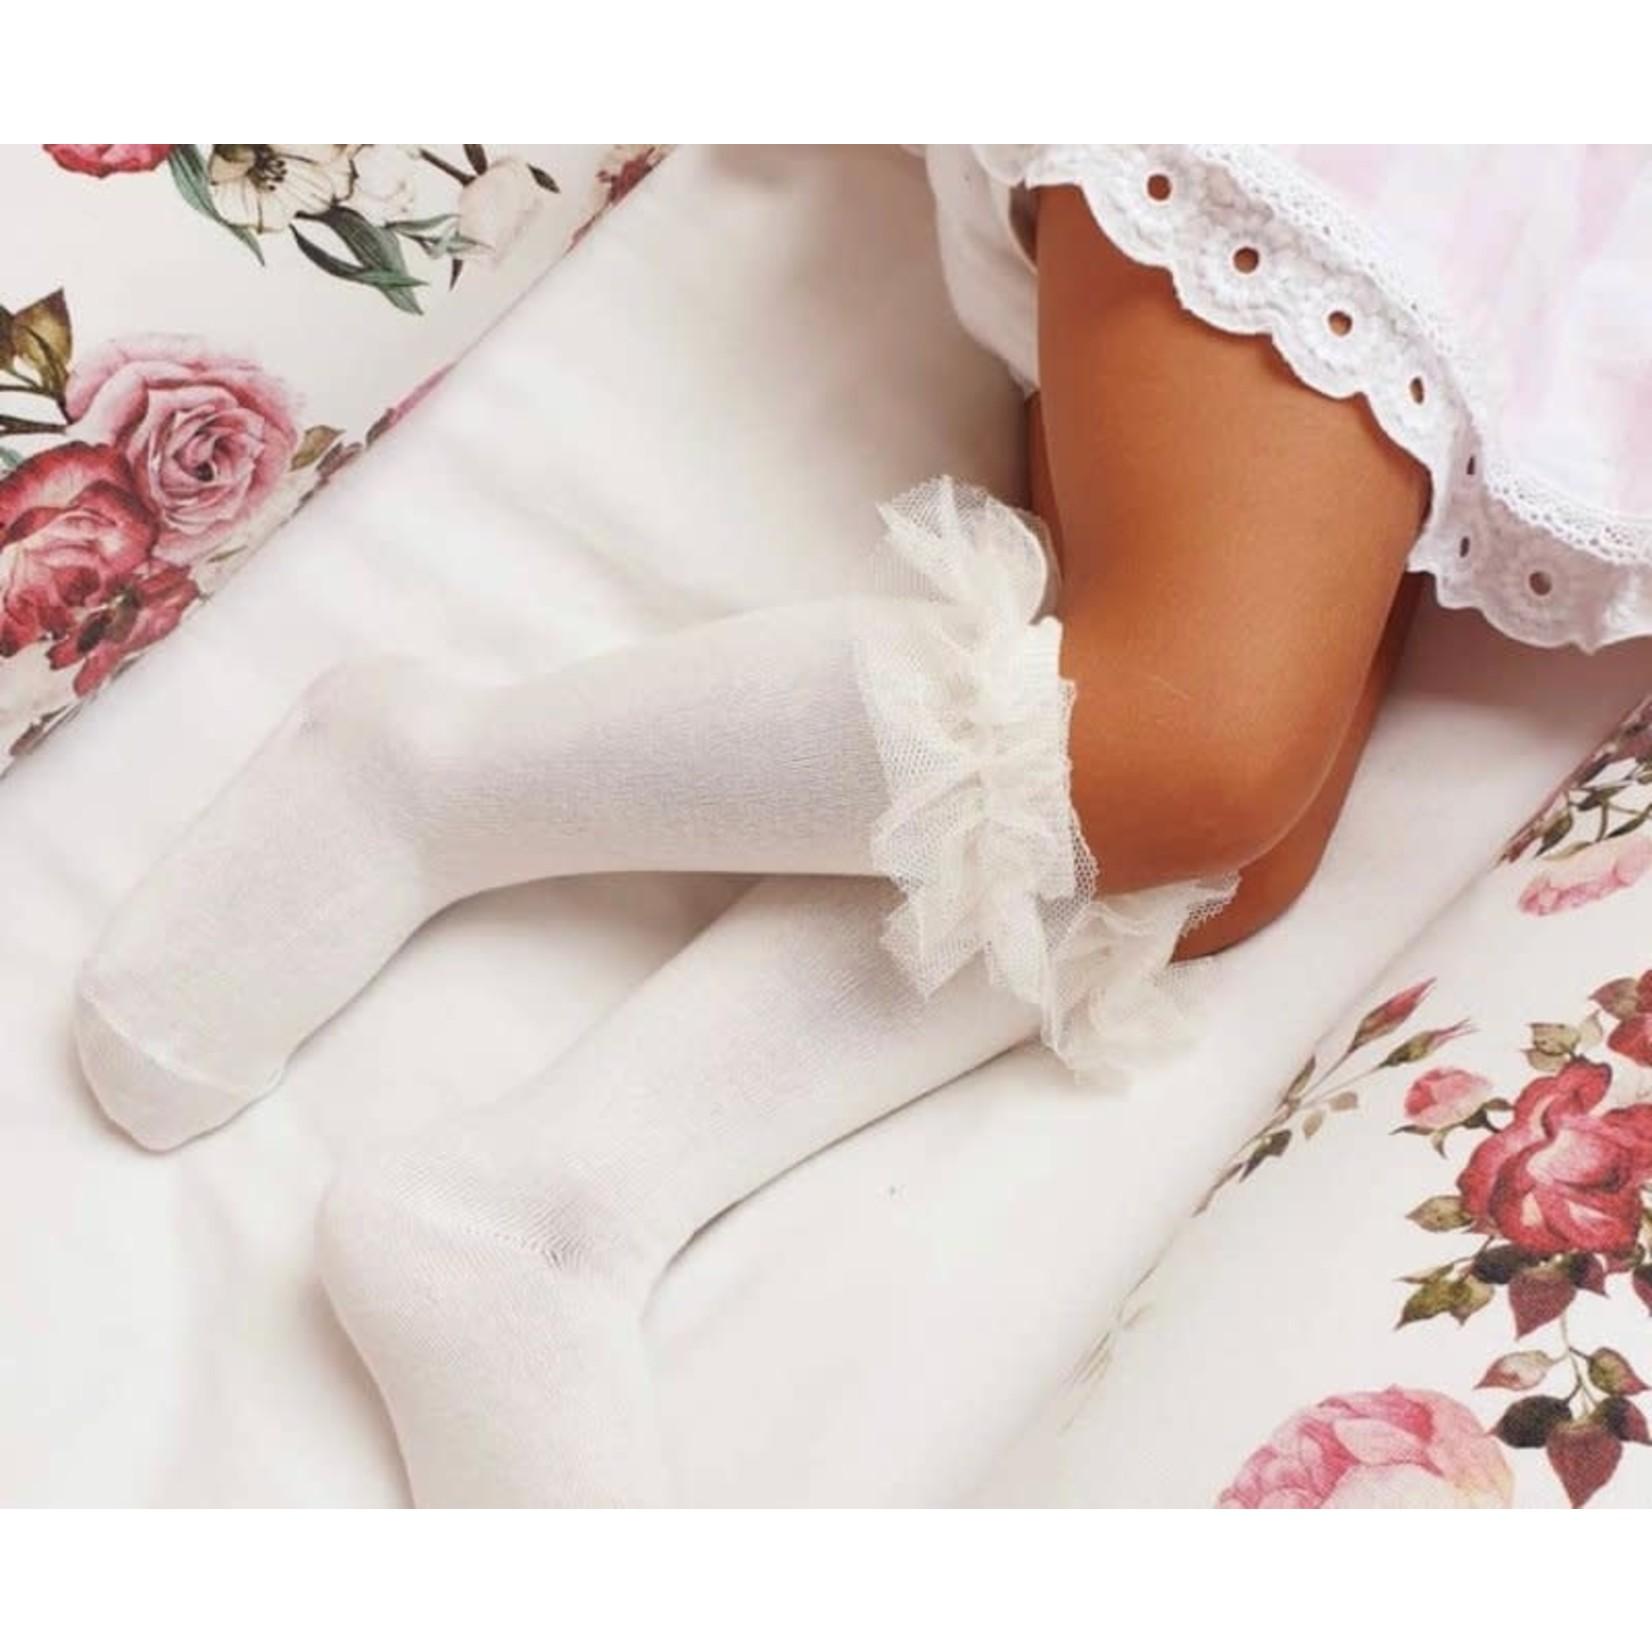 Ruffle Socks Knee High - Cream